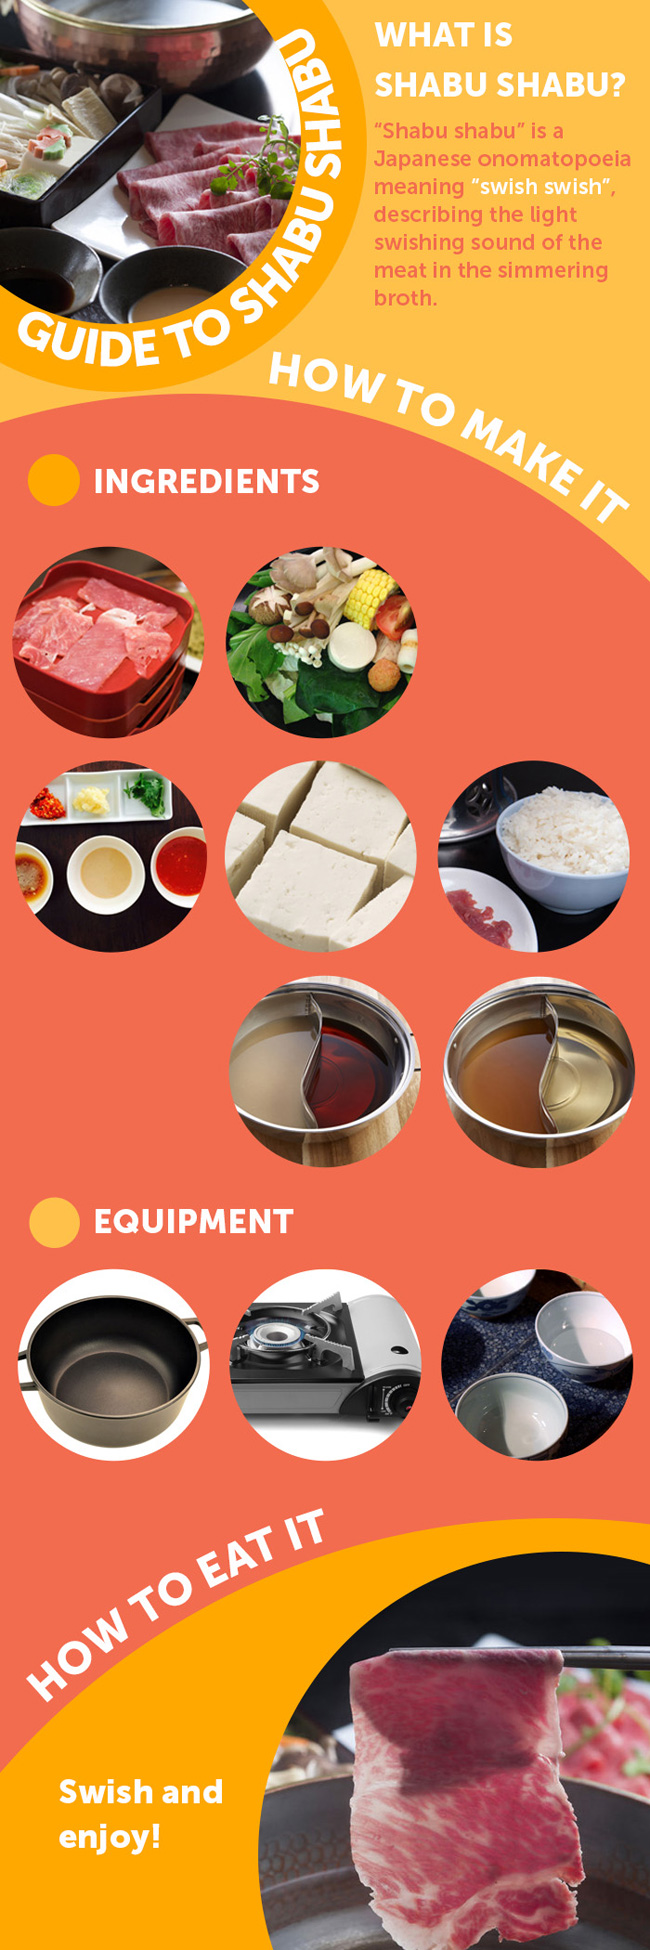 What is Shabu Shabu? A Guide to Japan's Swishiest Dish